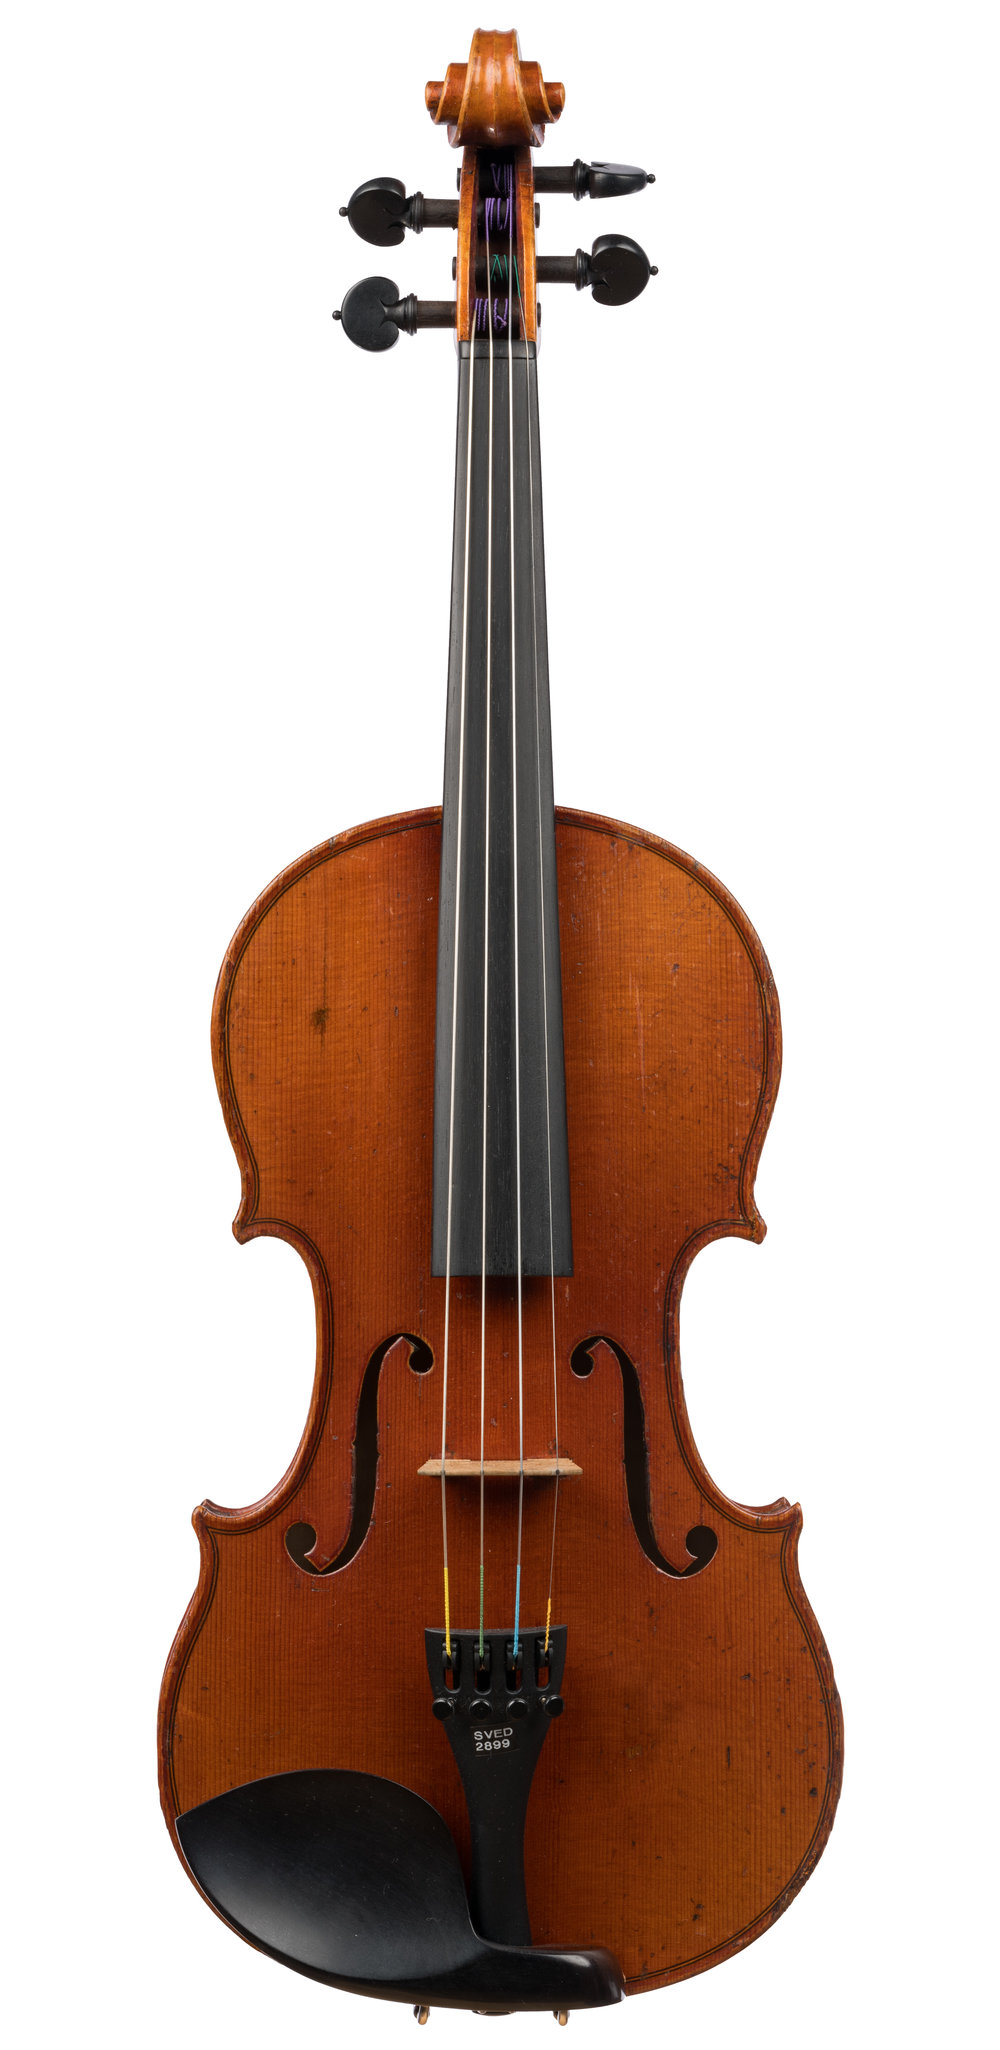 Unlabeled German Violin, ca 1930 -